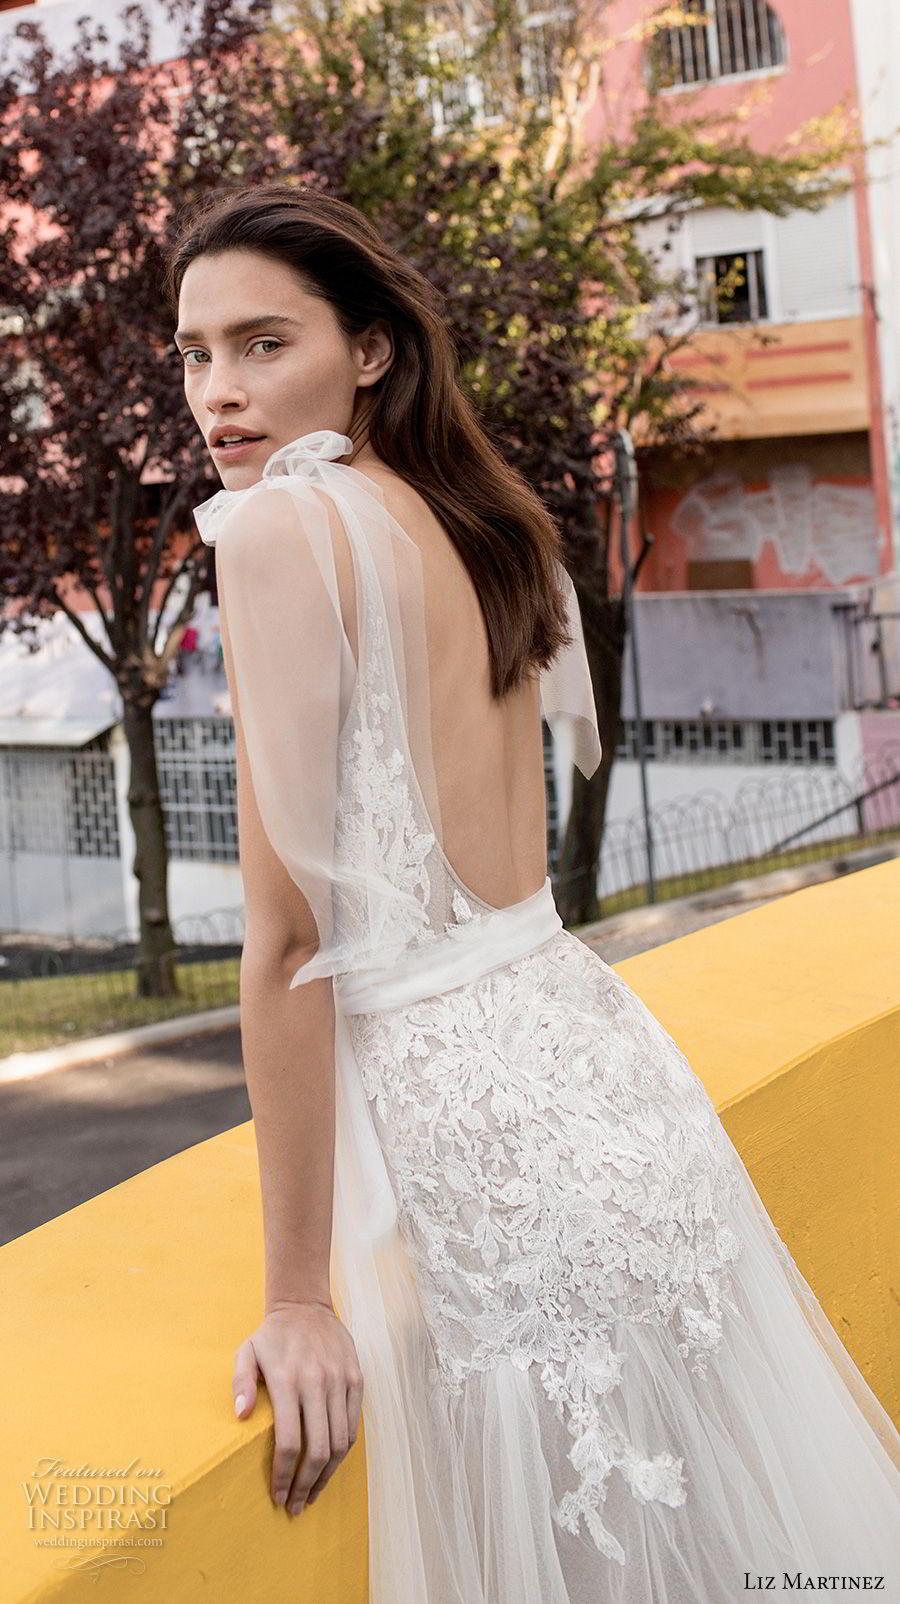 liz martinez 2018 lisbon sleeveless deep v neck heavily embellished bodice tulle skirt romantic a line wedding dress open scoop back chapel train (14) zbv